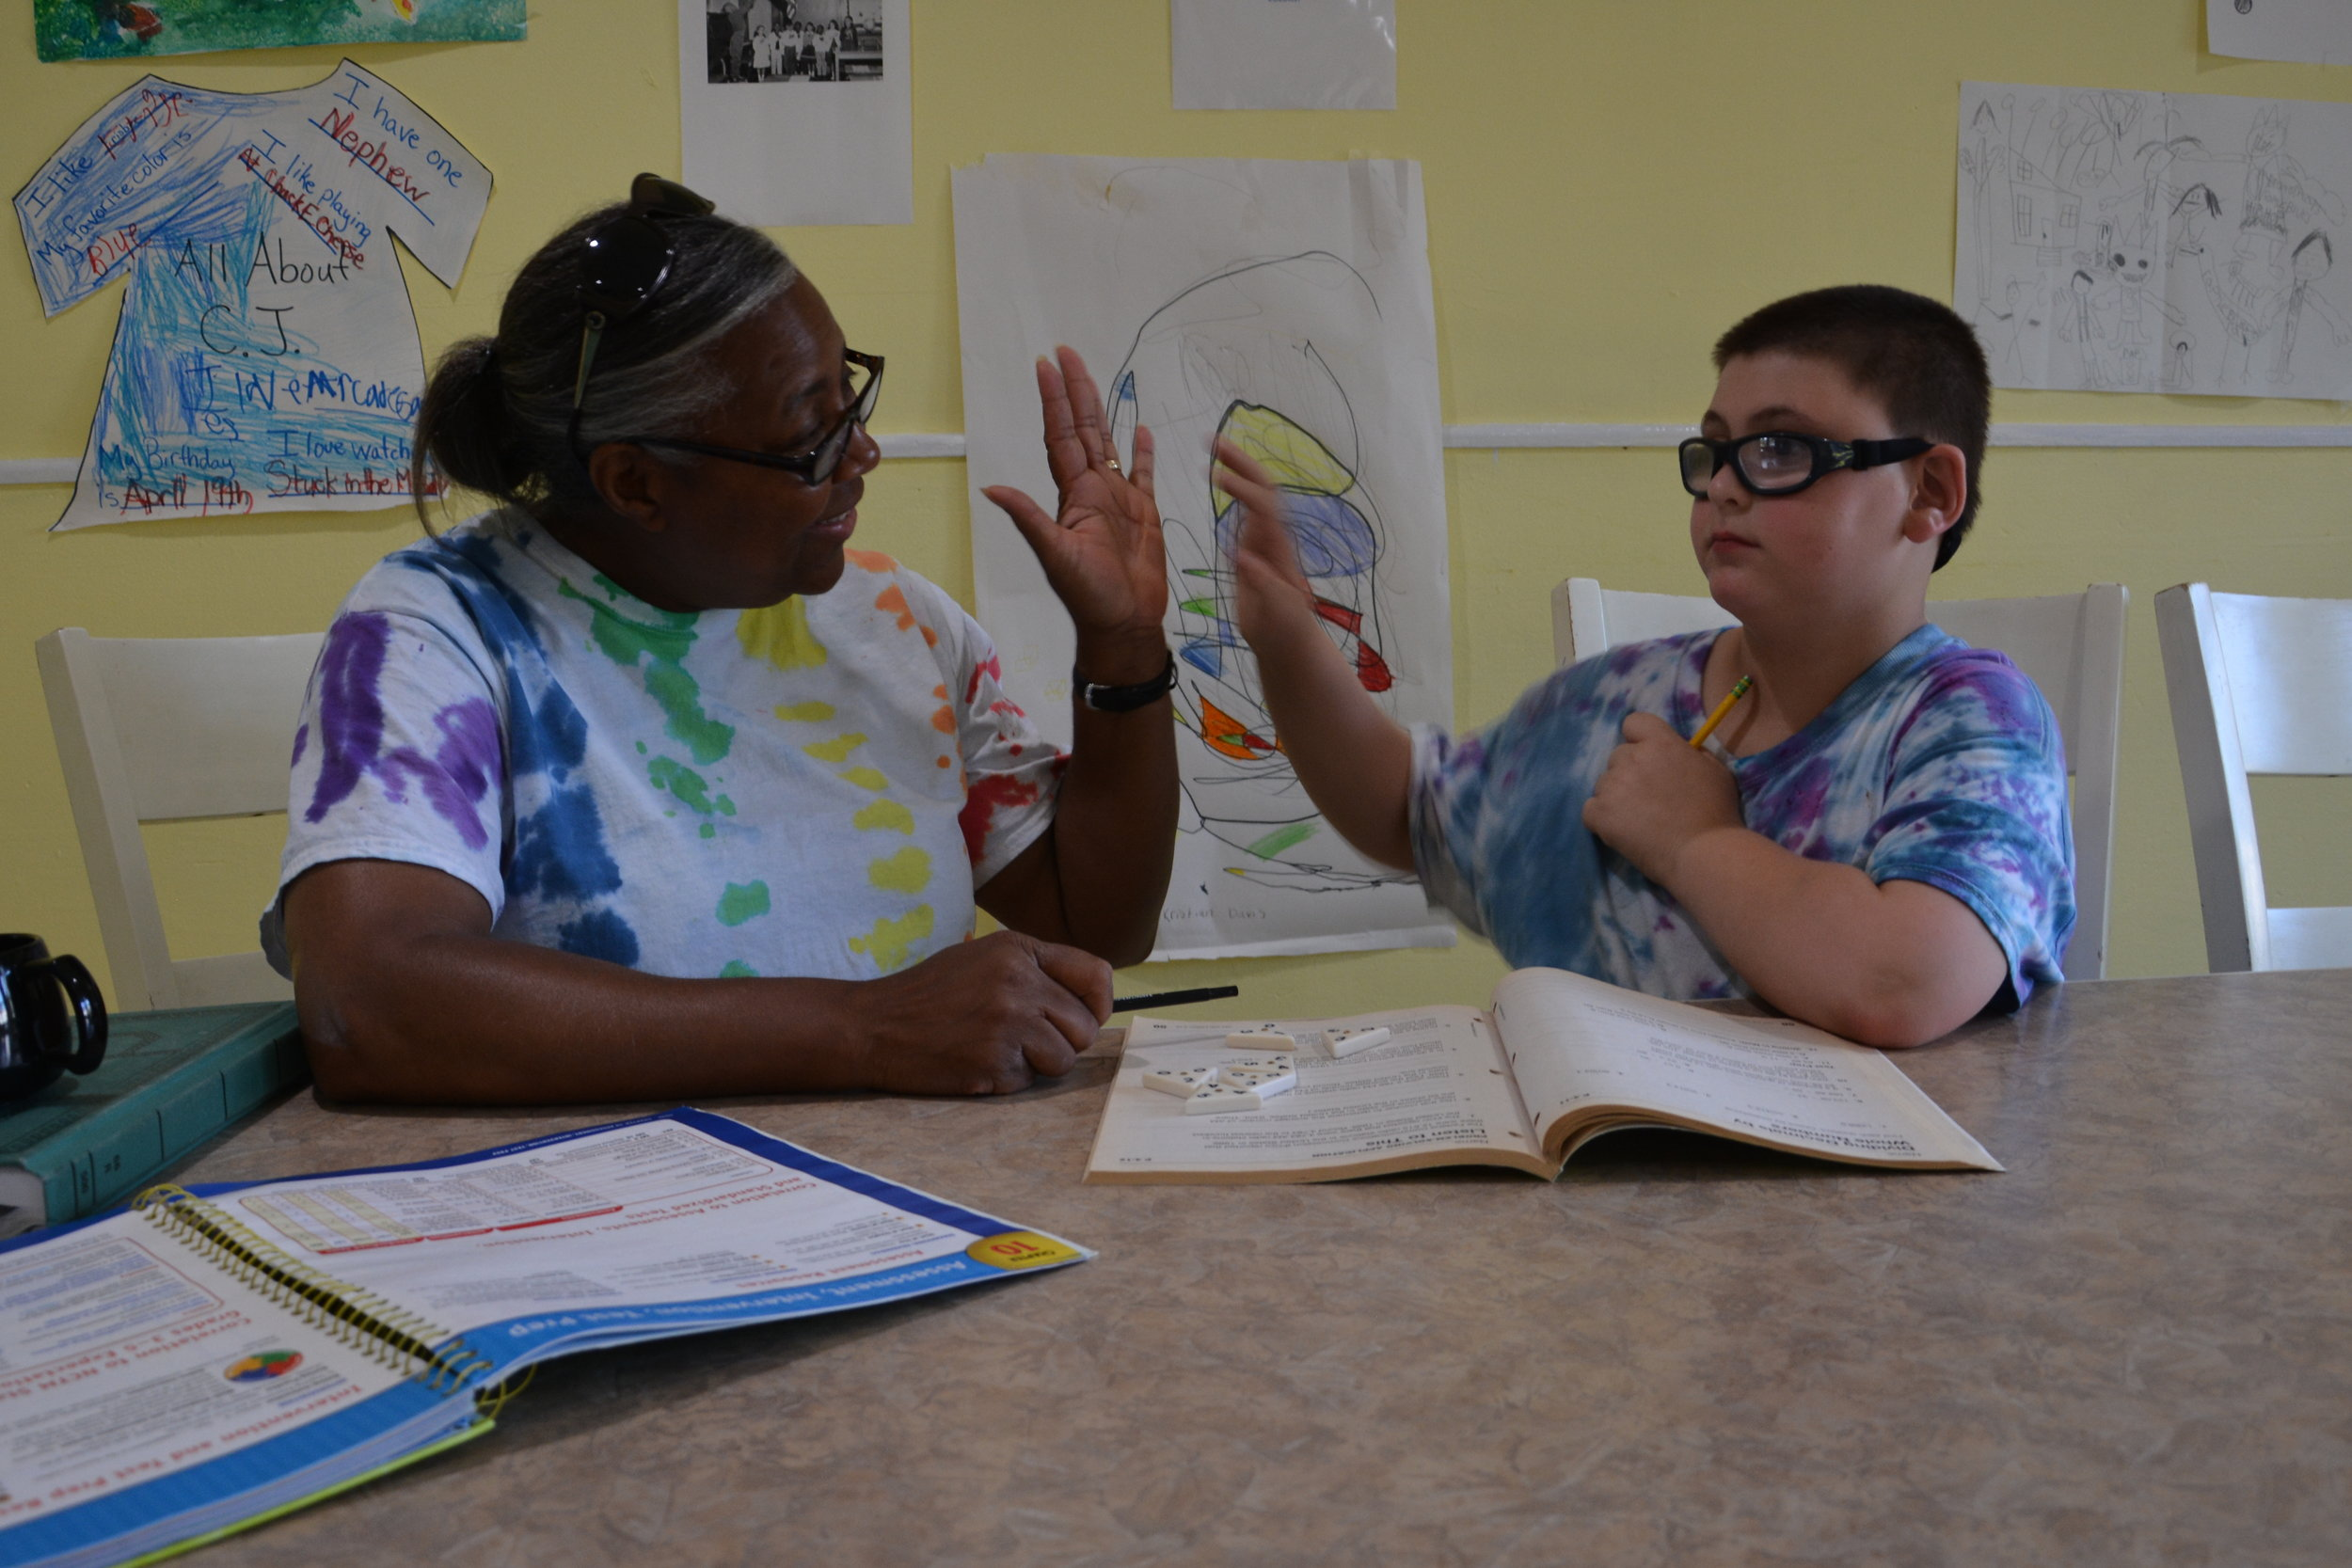 Student and Staff doing homework